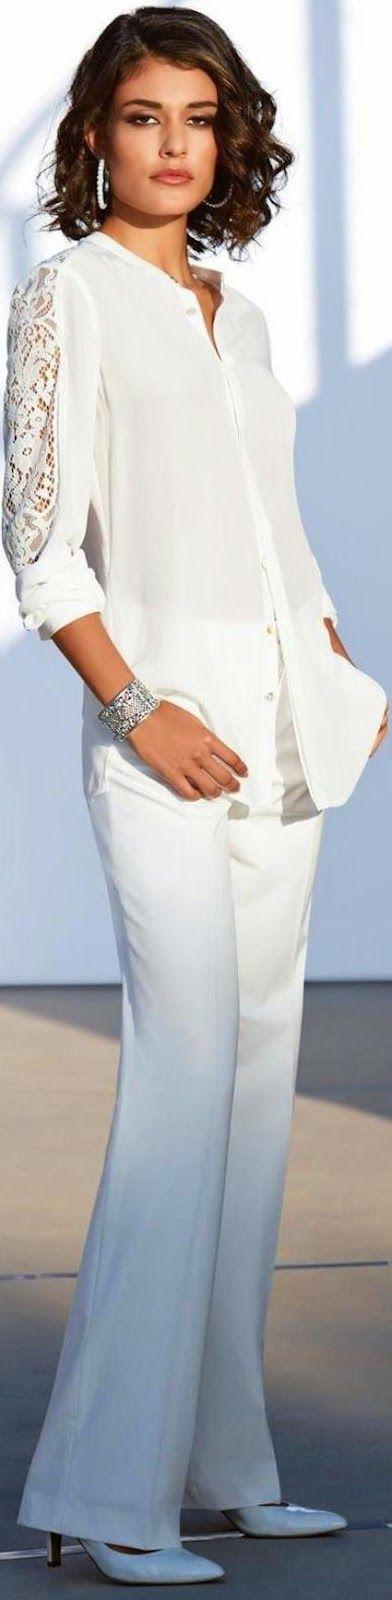 Camisa de seda com renda branca